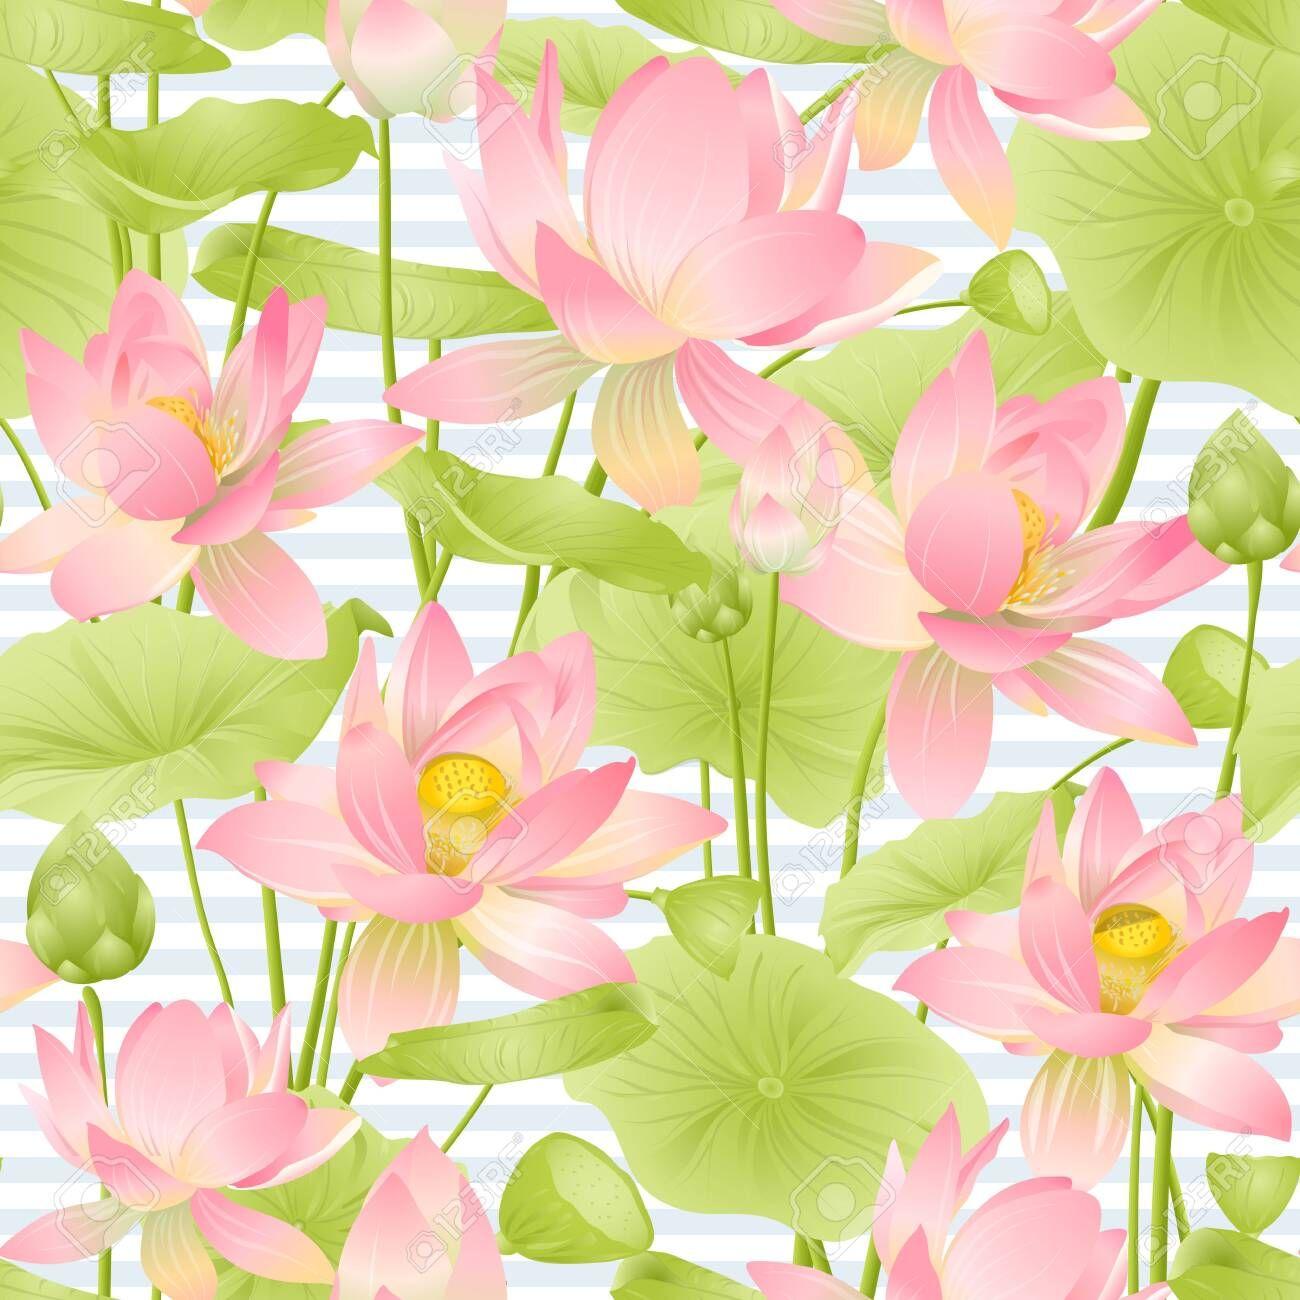 Lotus flowers seamless pattern. Vector illustration. On